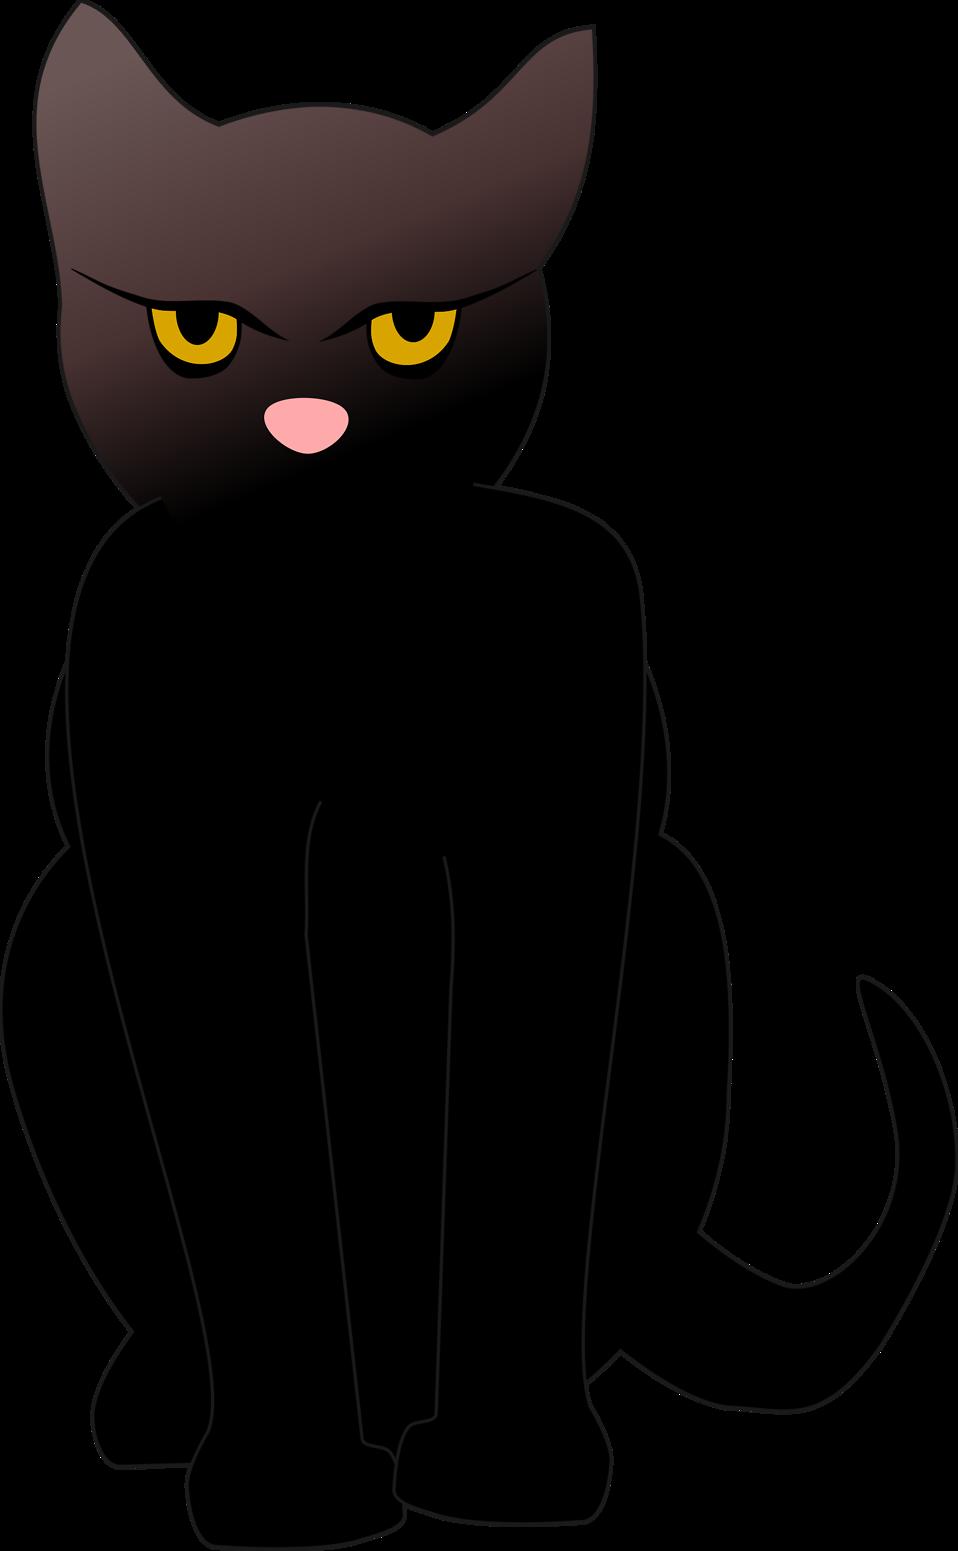 Illustrated Silhouette Of A Black Cat Free Stock Photo Black Cartoon Feline Cats